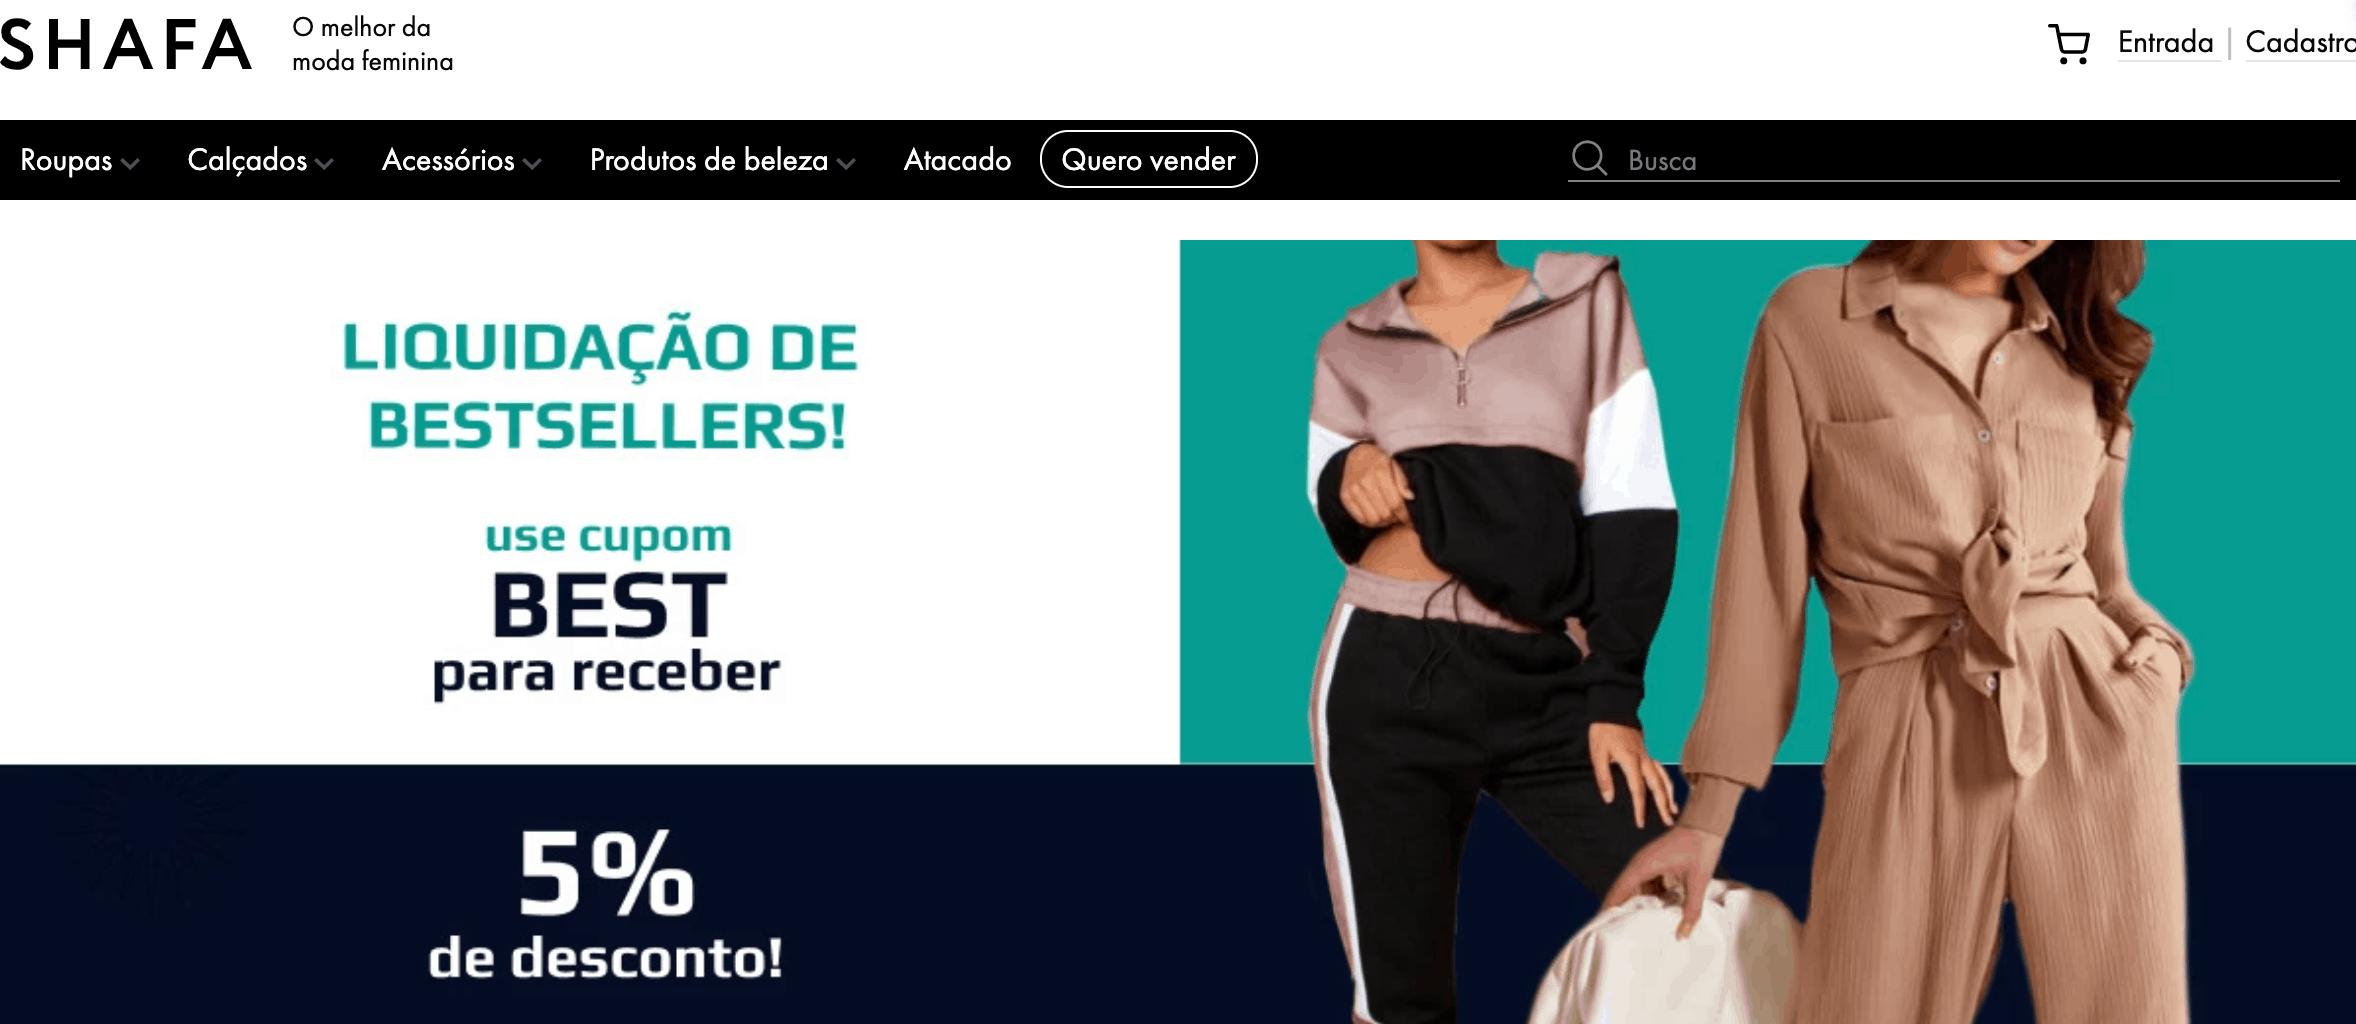 Интерфейс shafa.com.br